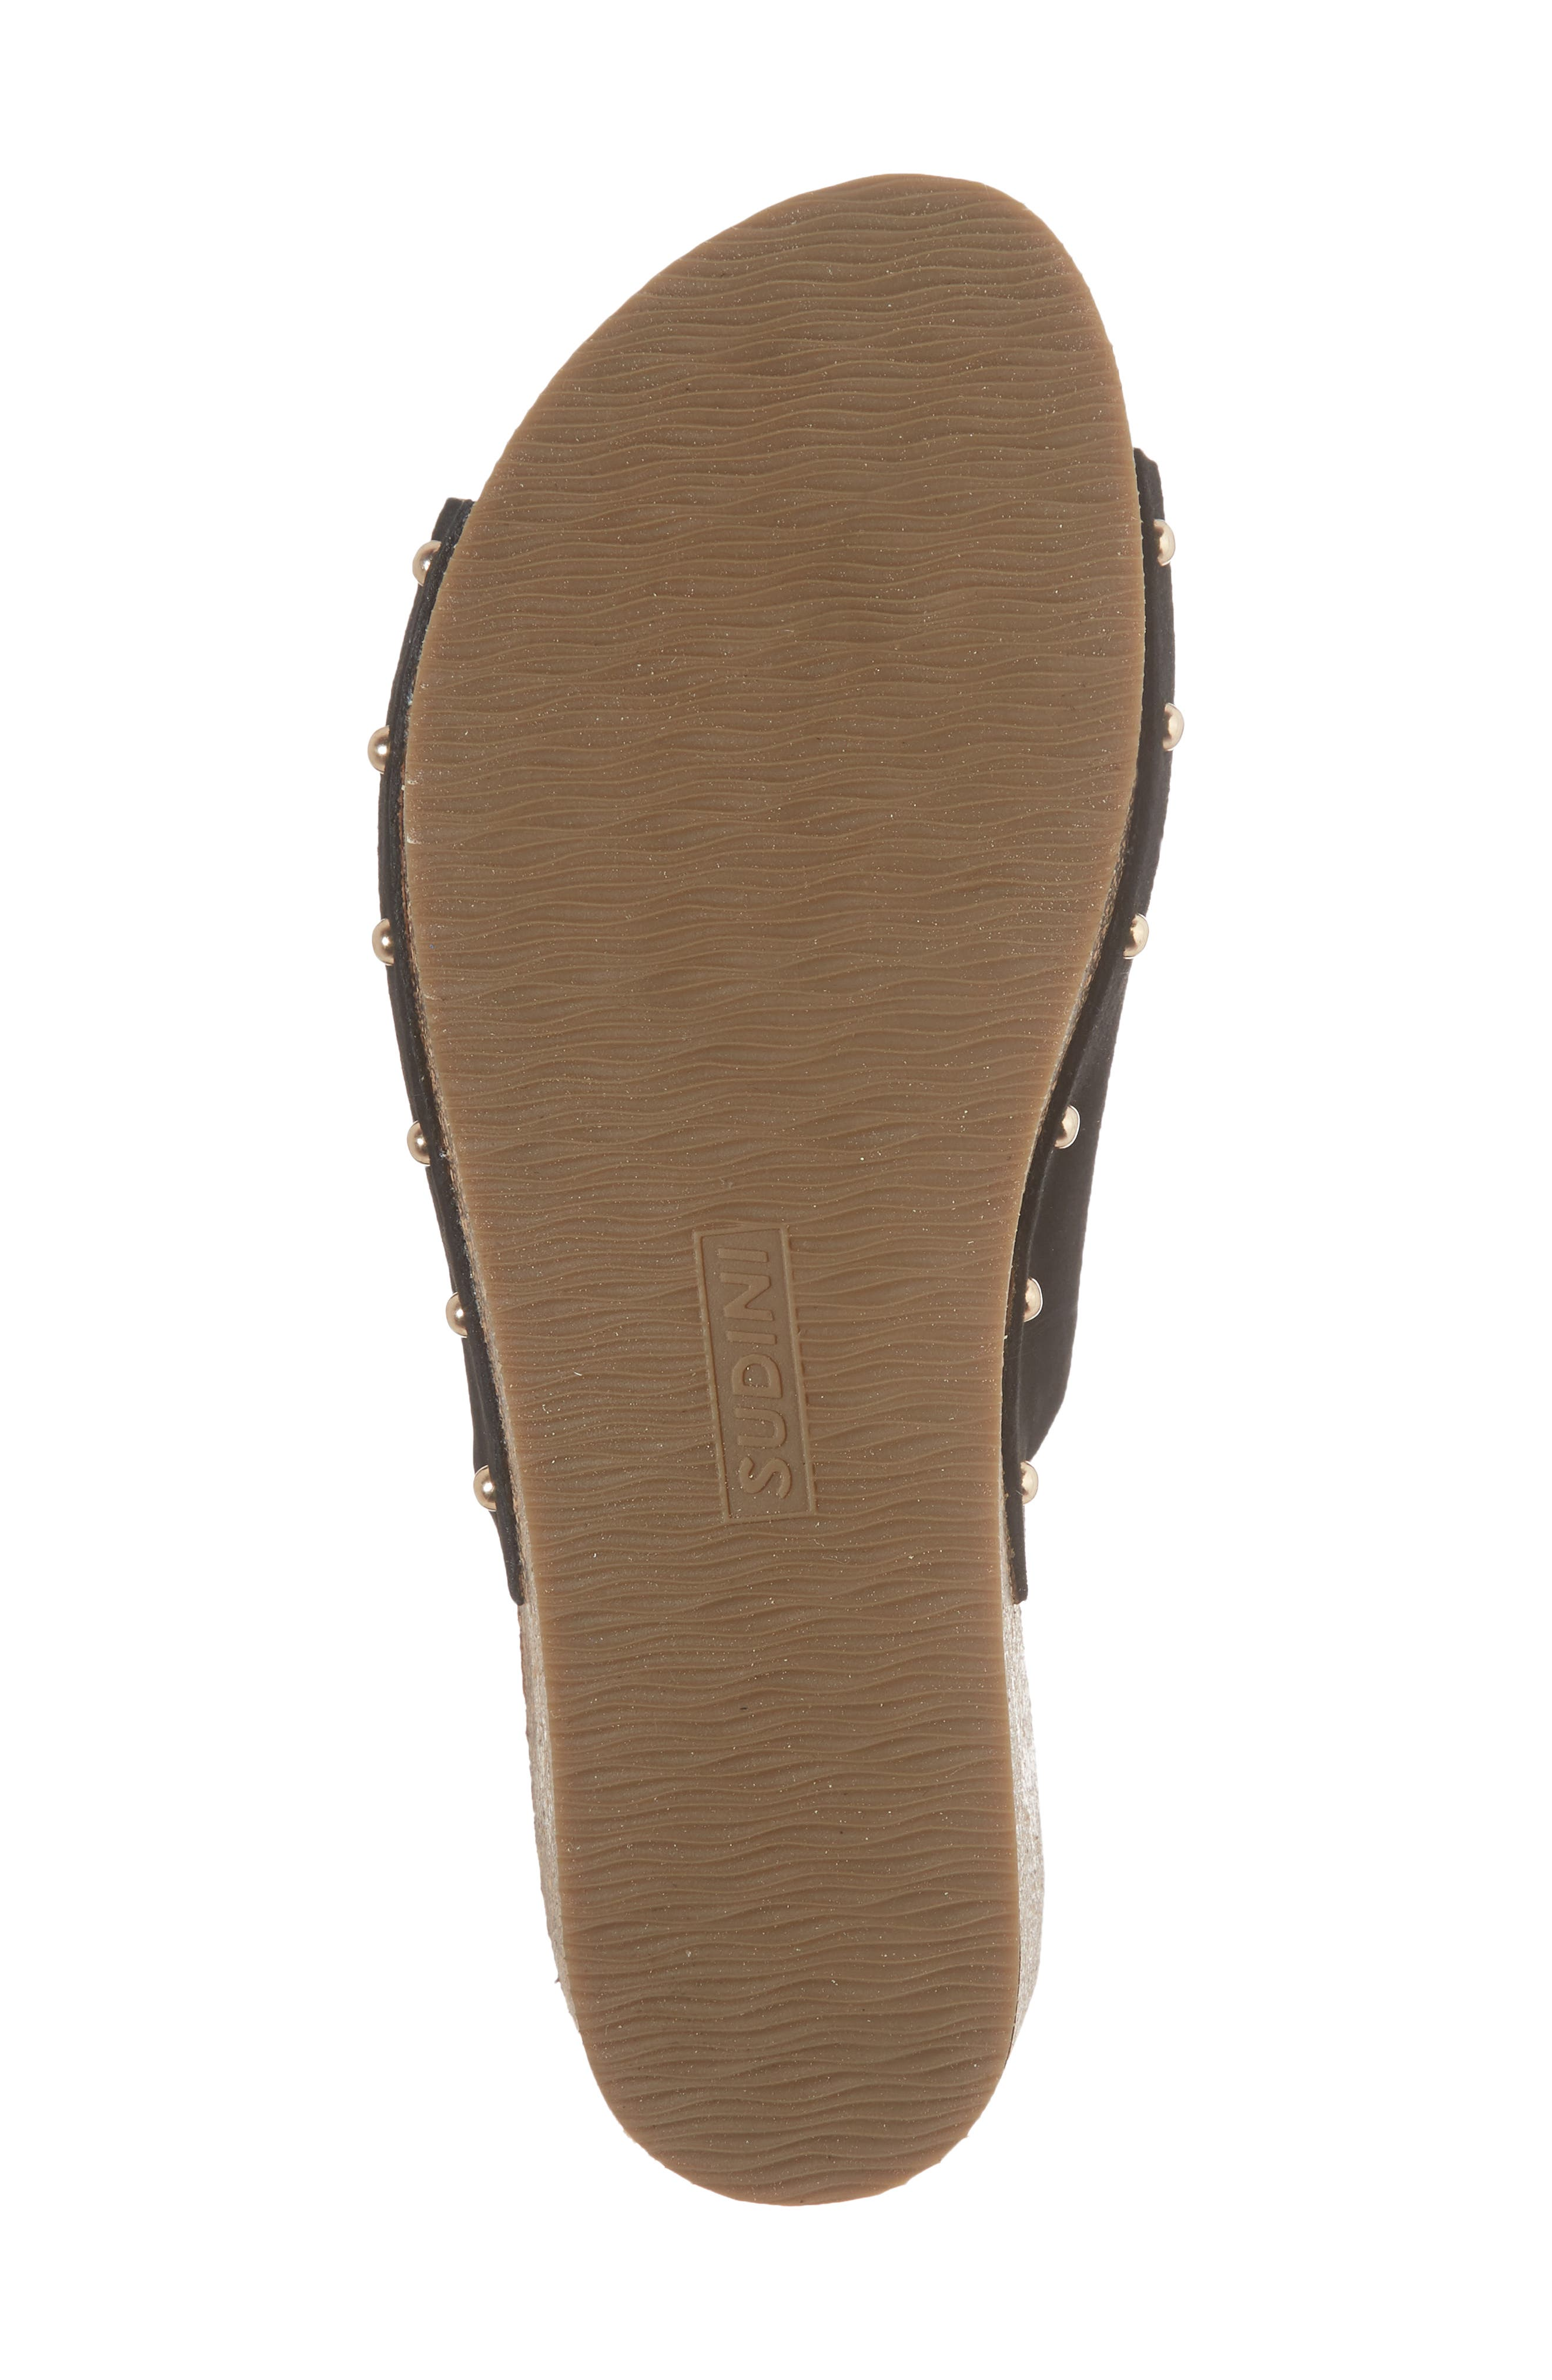 Pavia Wedge Mule,                             Alternate thumbnail 6, color,                             Black Leather